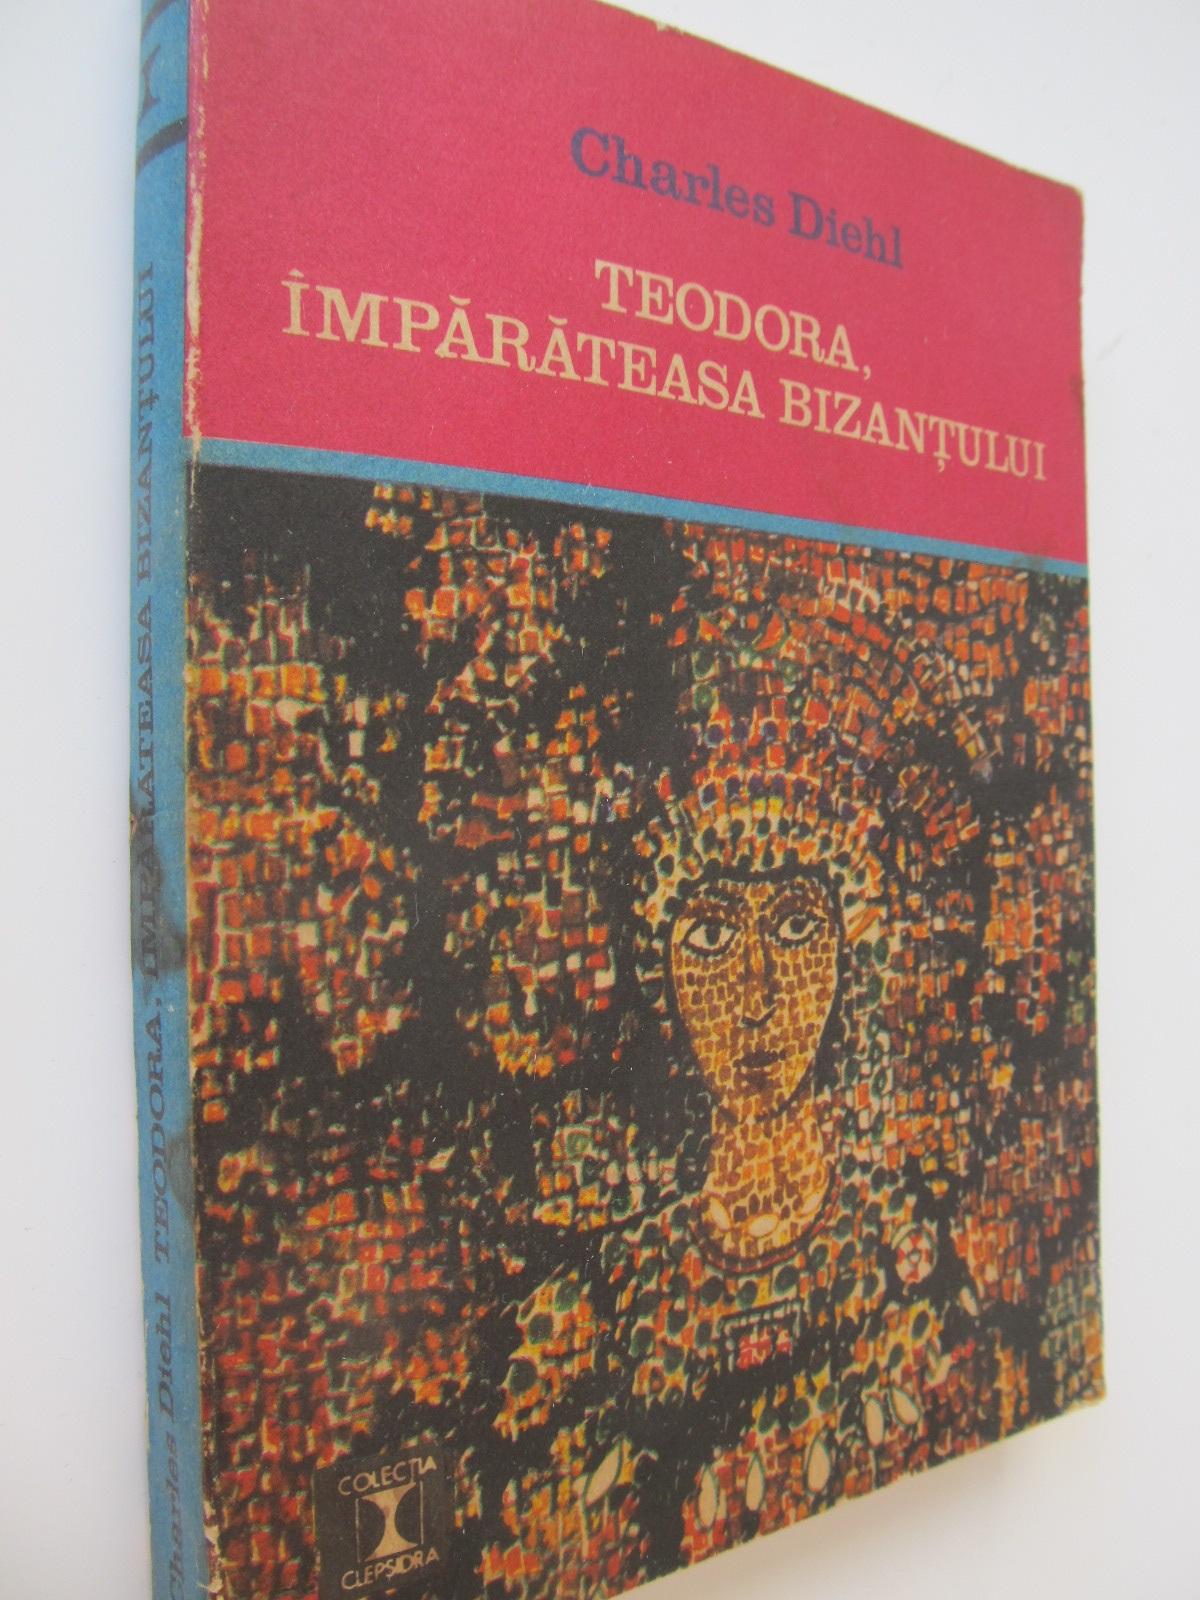 Teodora imparateasa bizantului - Charles Diehl | Detalii carte